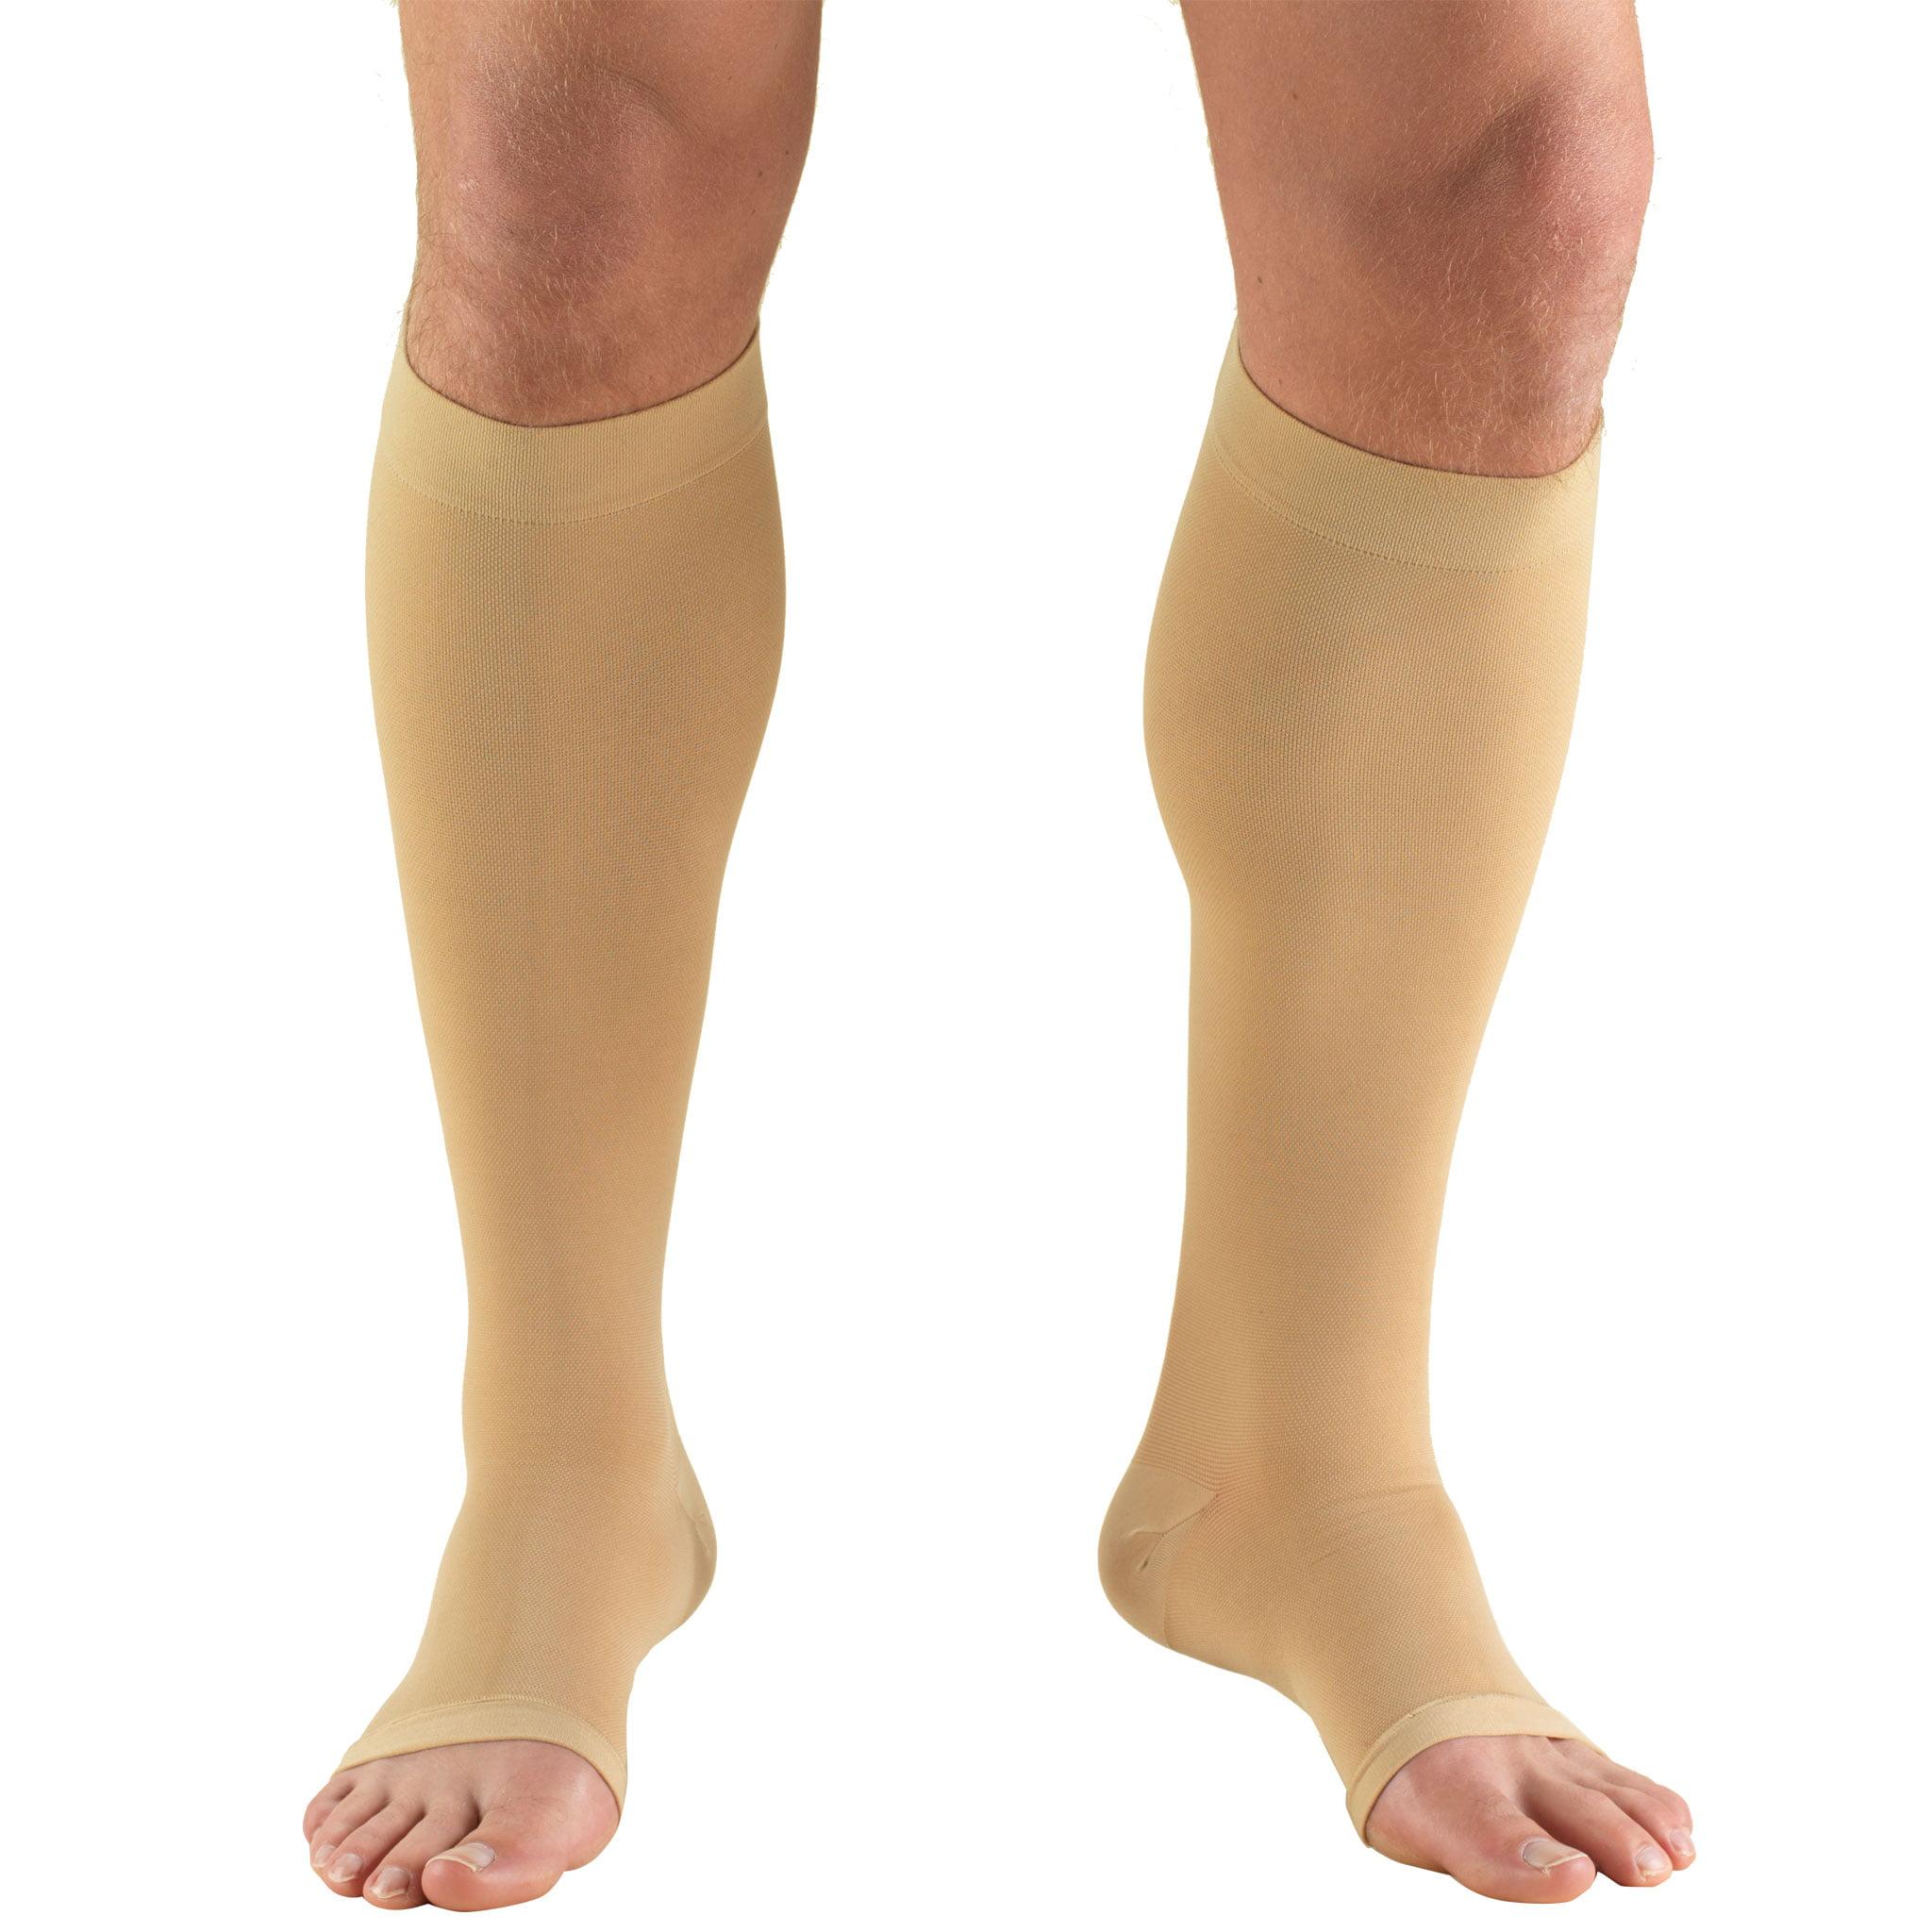 Truform Stockings, Knee High, Open Toe: 30-40 mmHg, Beige, 3X-Large